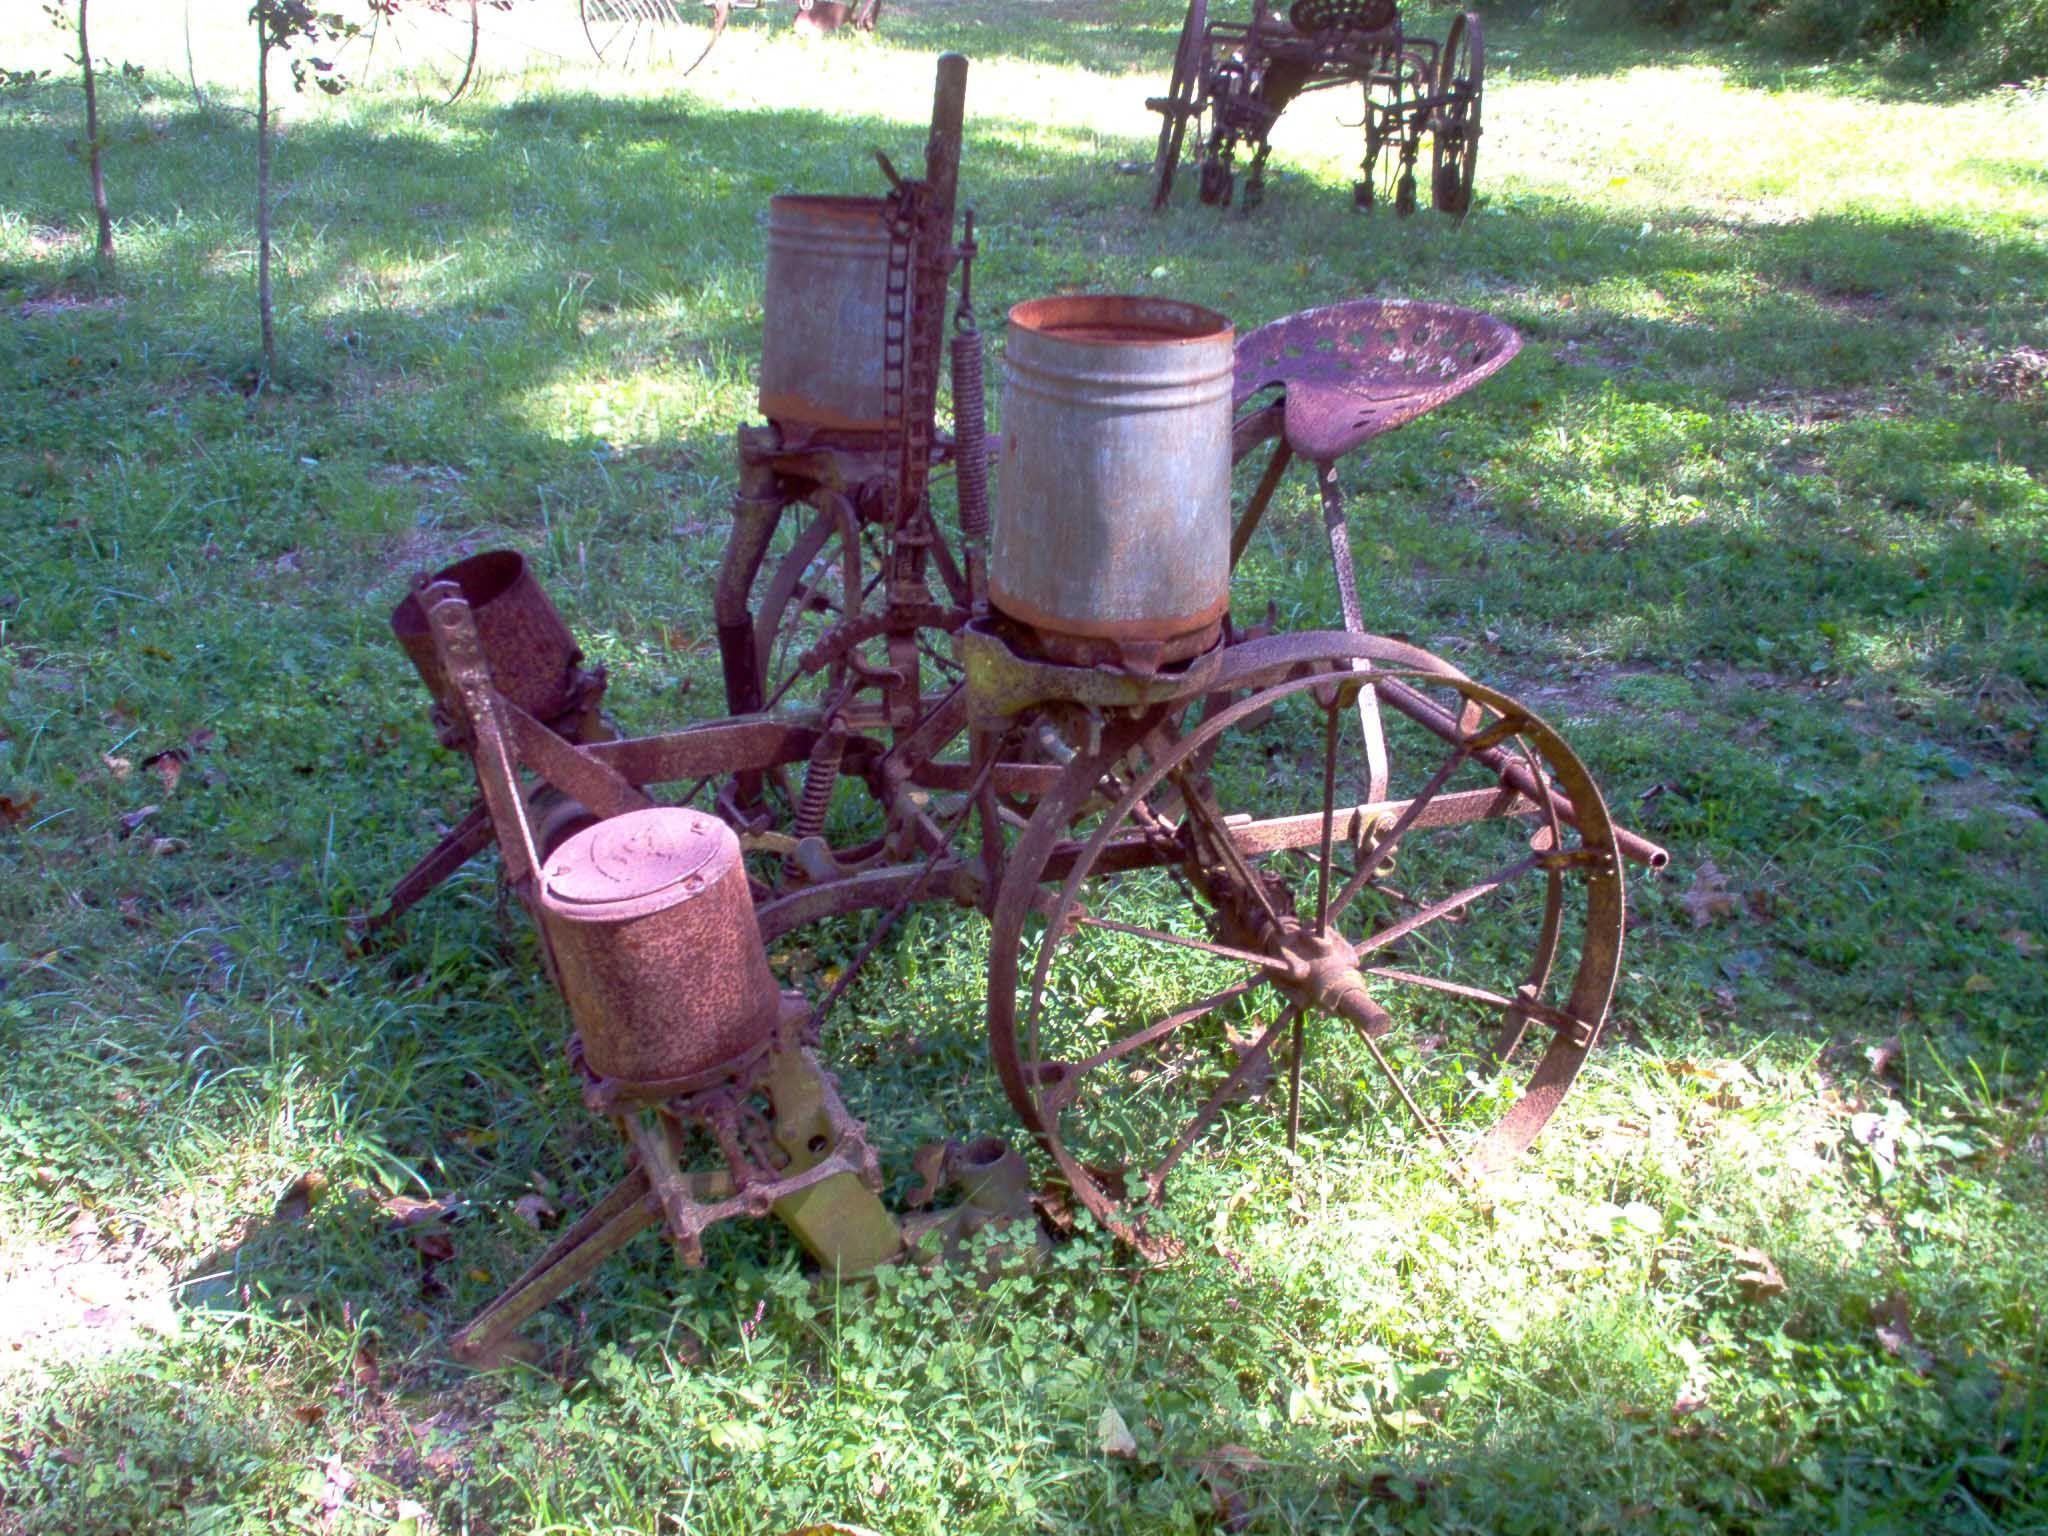 Antique Farm Equipment For Sale Maquinaria Agricola Tractor Carretilla